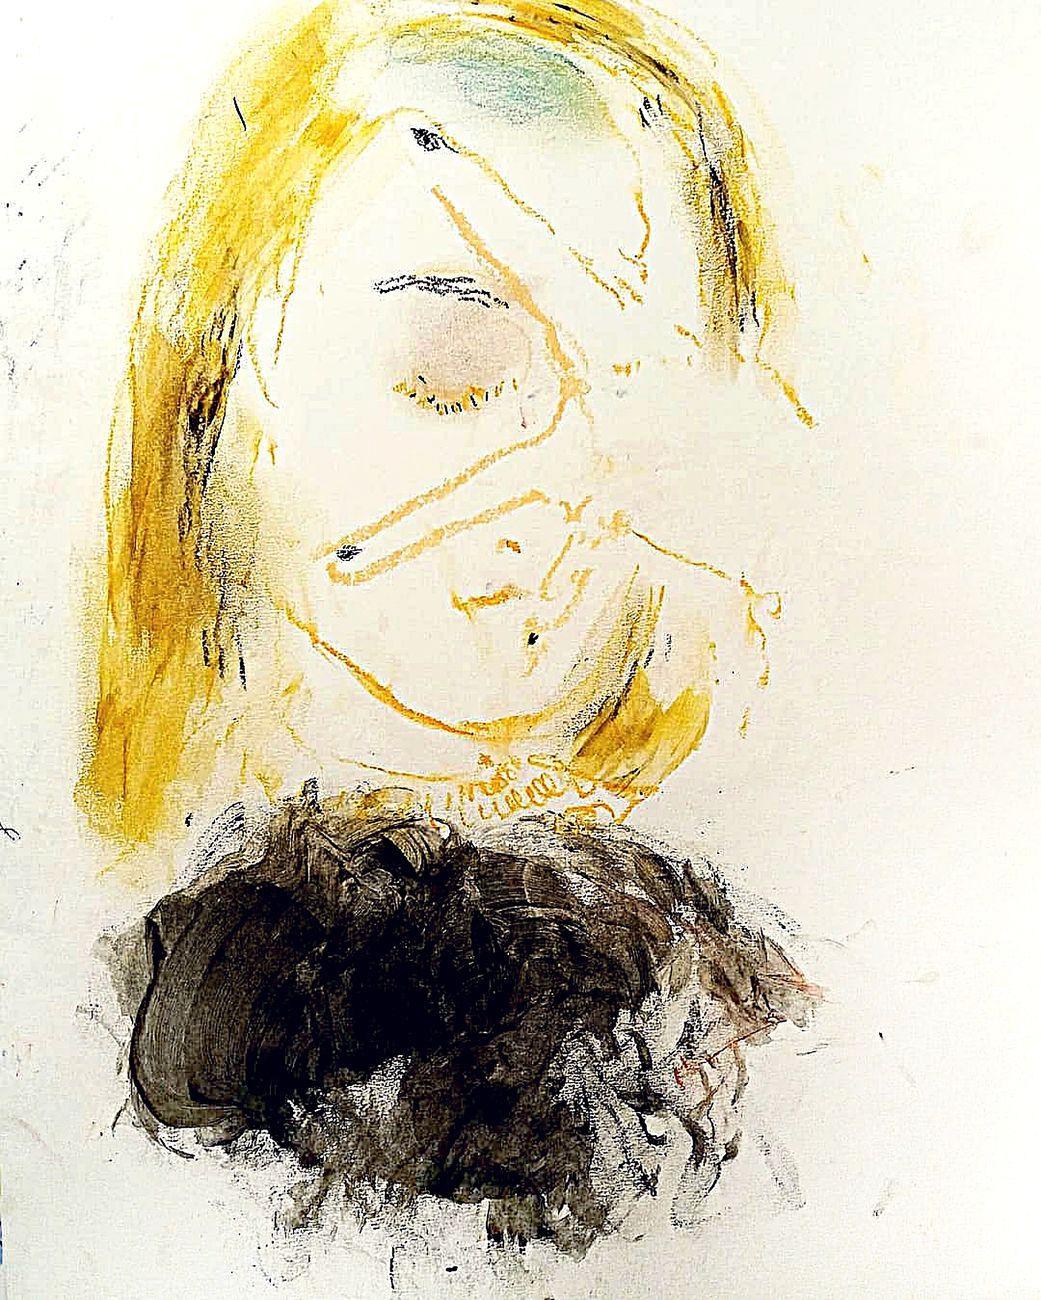 Elisa Filomena, Donna, pastelli su carta, cm 35x55, 2018